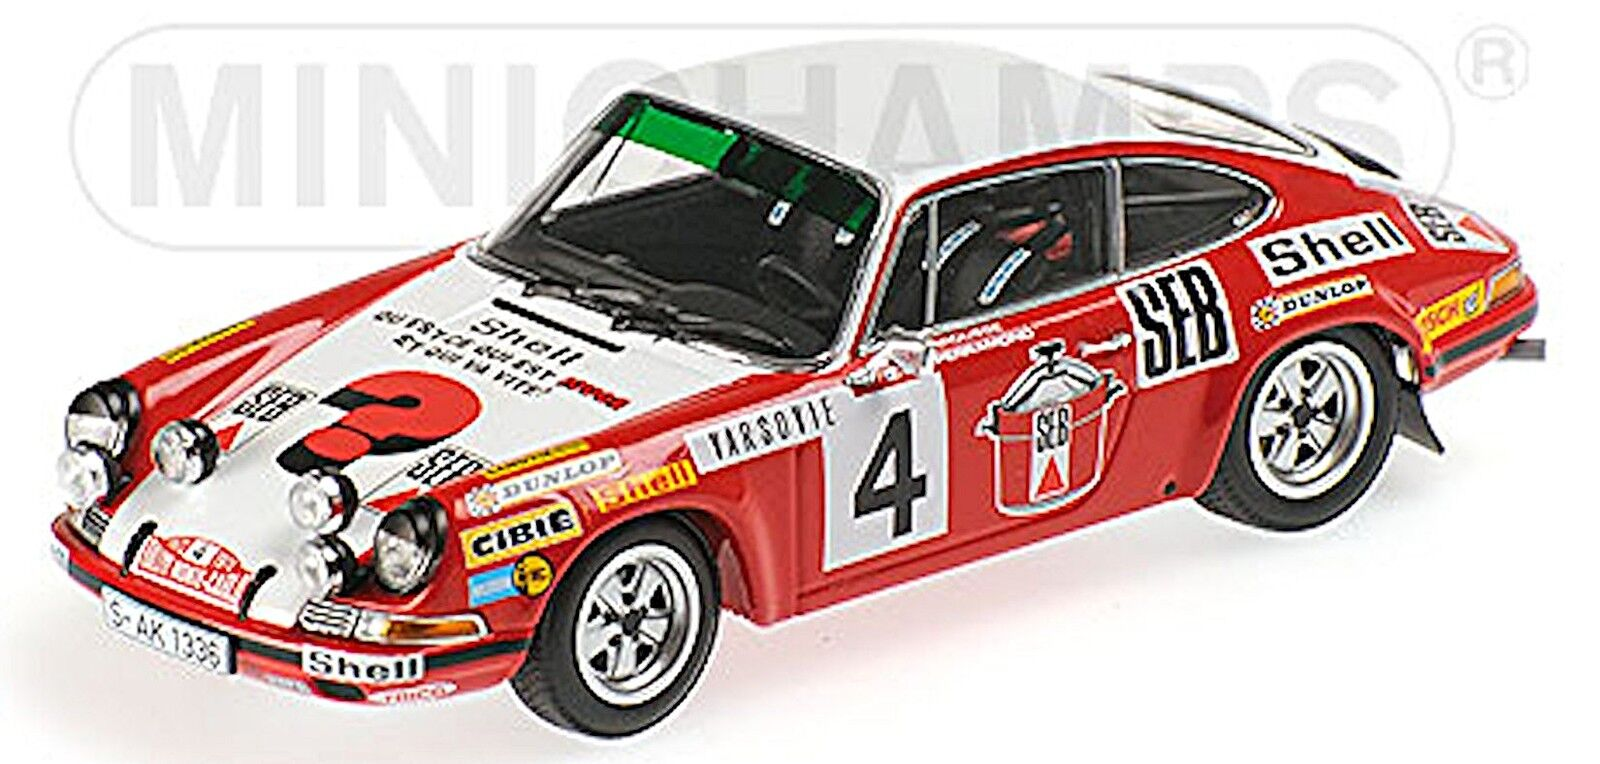 Porsche 911 s 2nd rallye monte carlo 1972 Larrousse perramond  4 - 1 43 Minicham